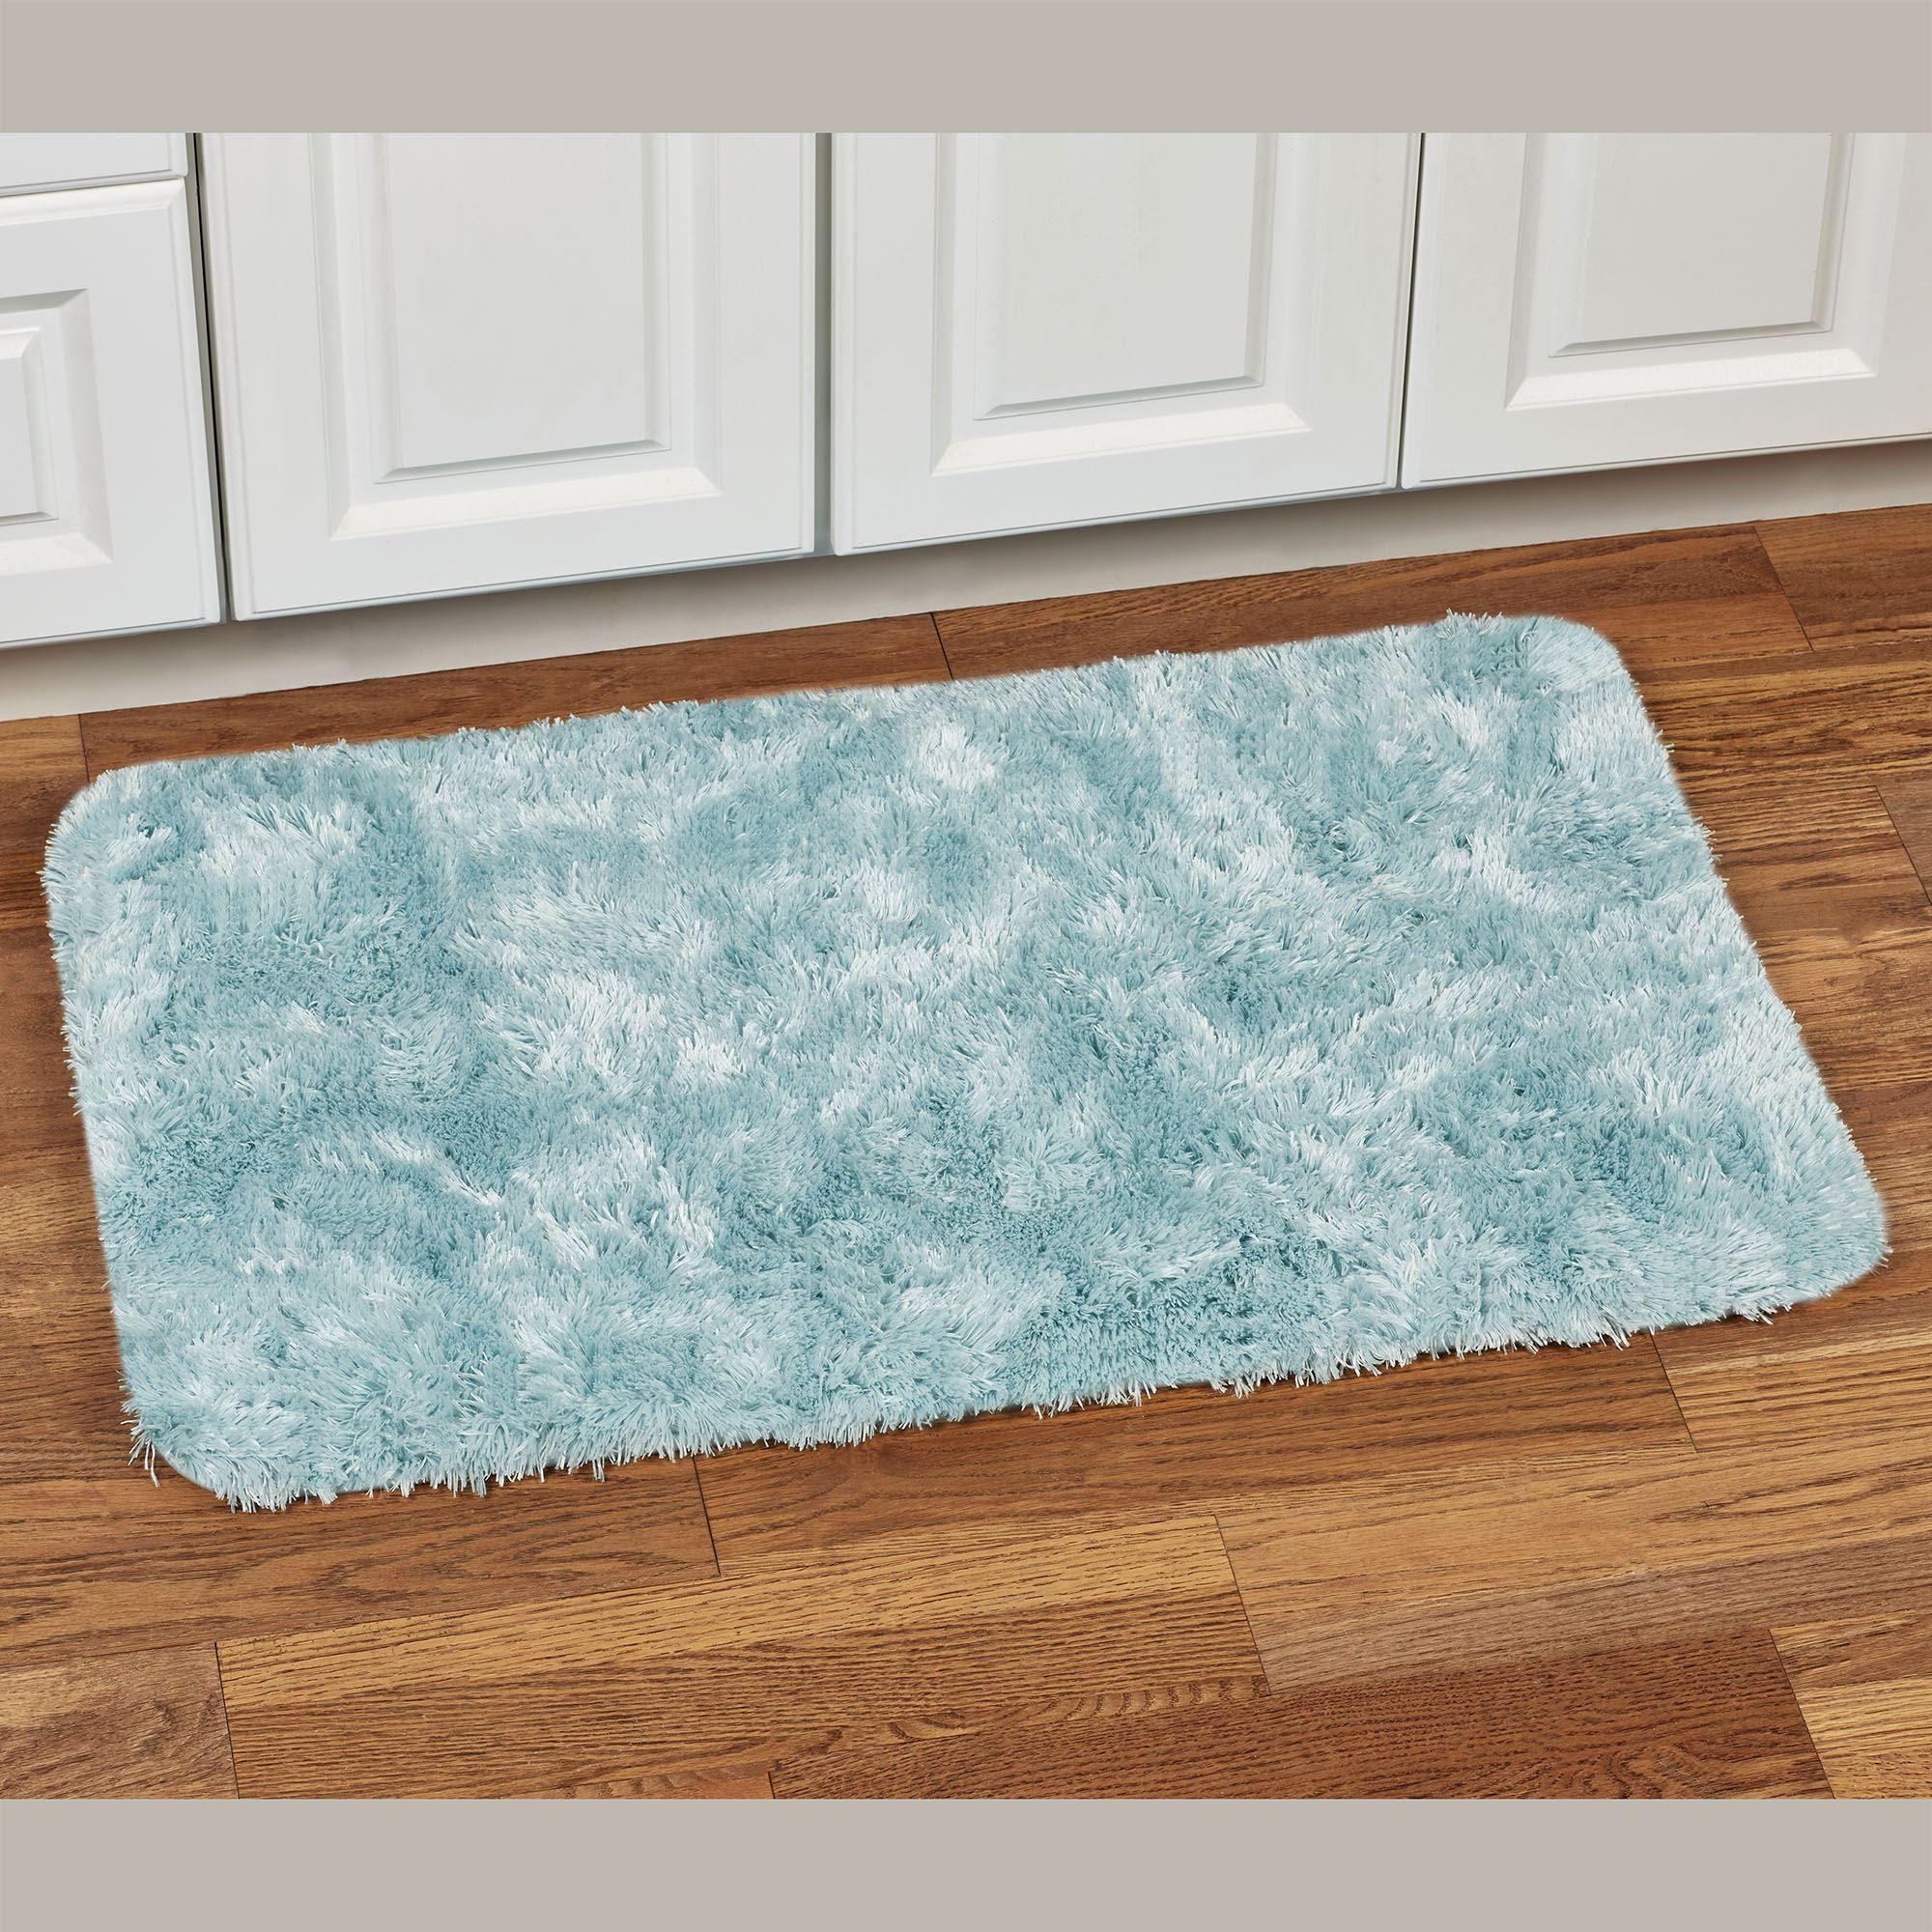 Super Soft Microfiber Faux Fur Bath Rugs